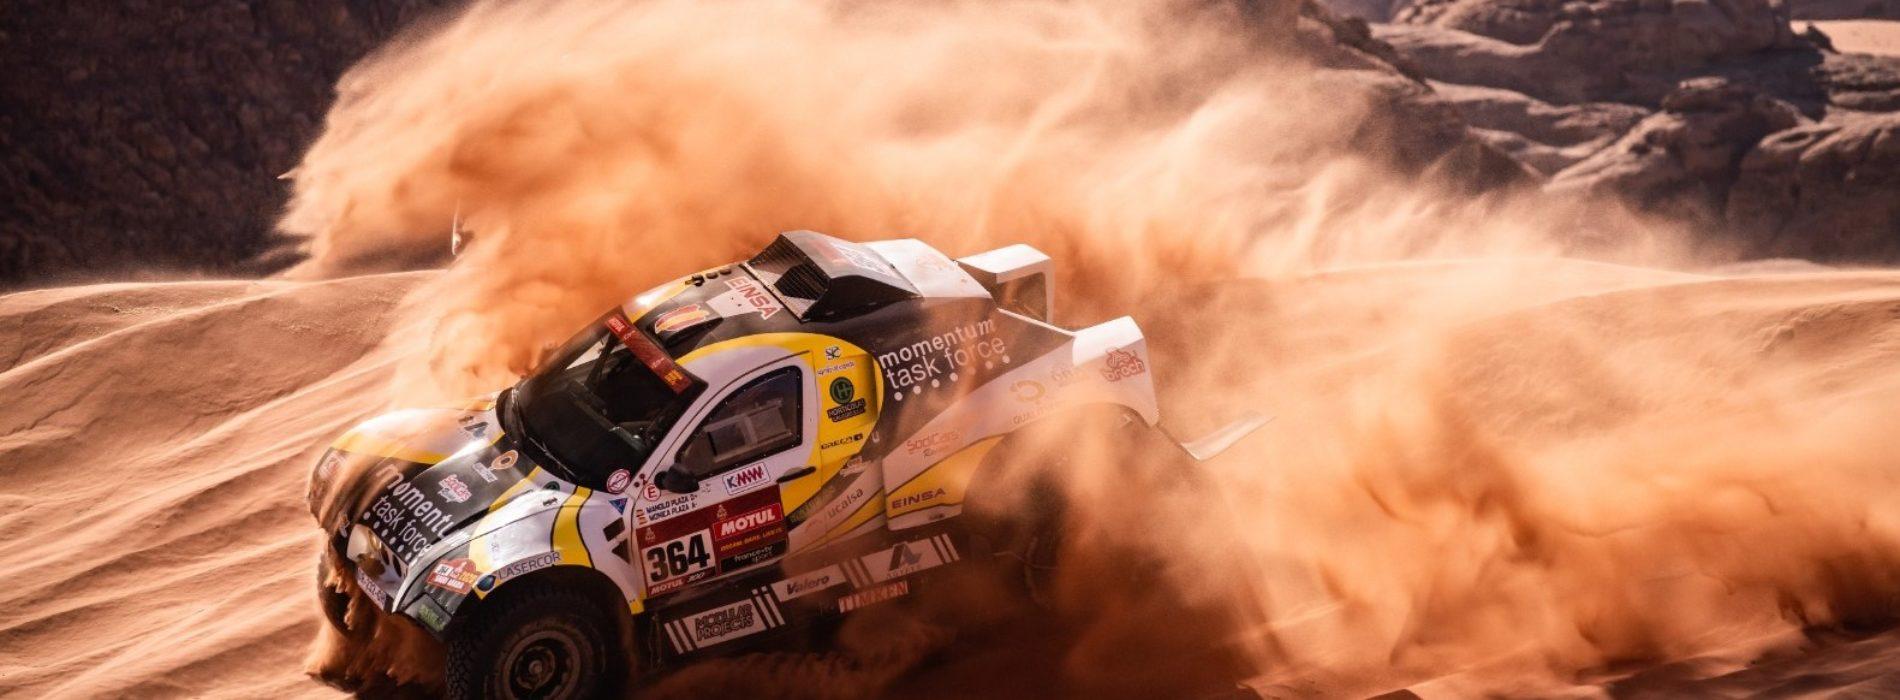 Monica Plaza joins her father- Manolo Plaza racing Dakar Rally 2021- Car category